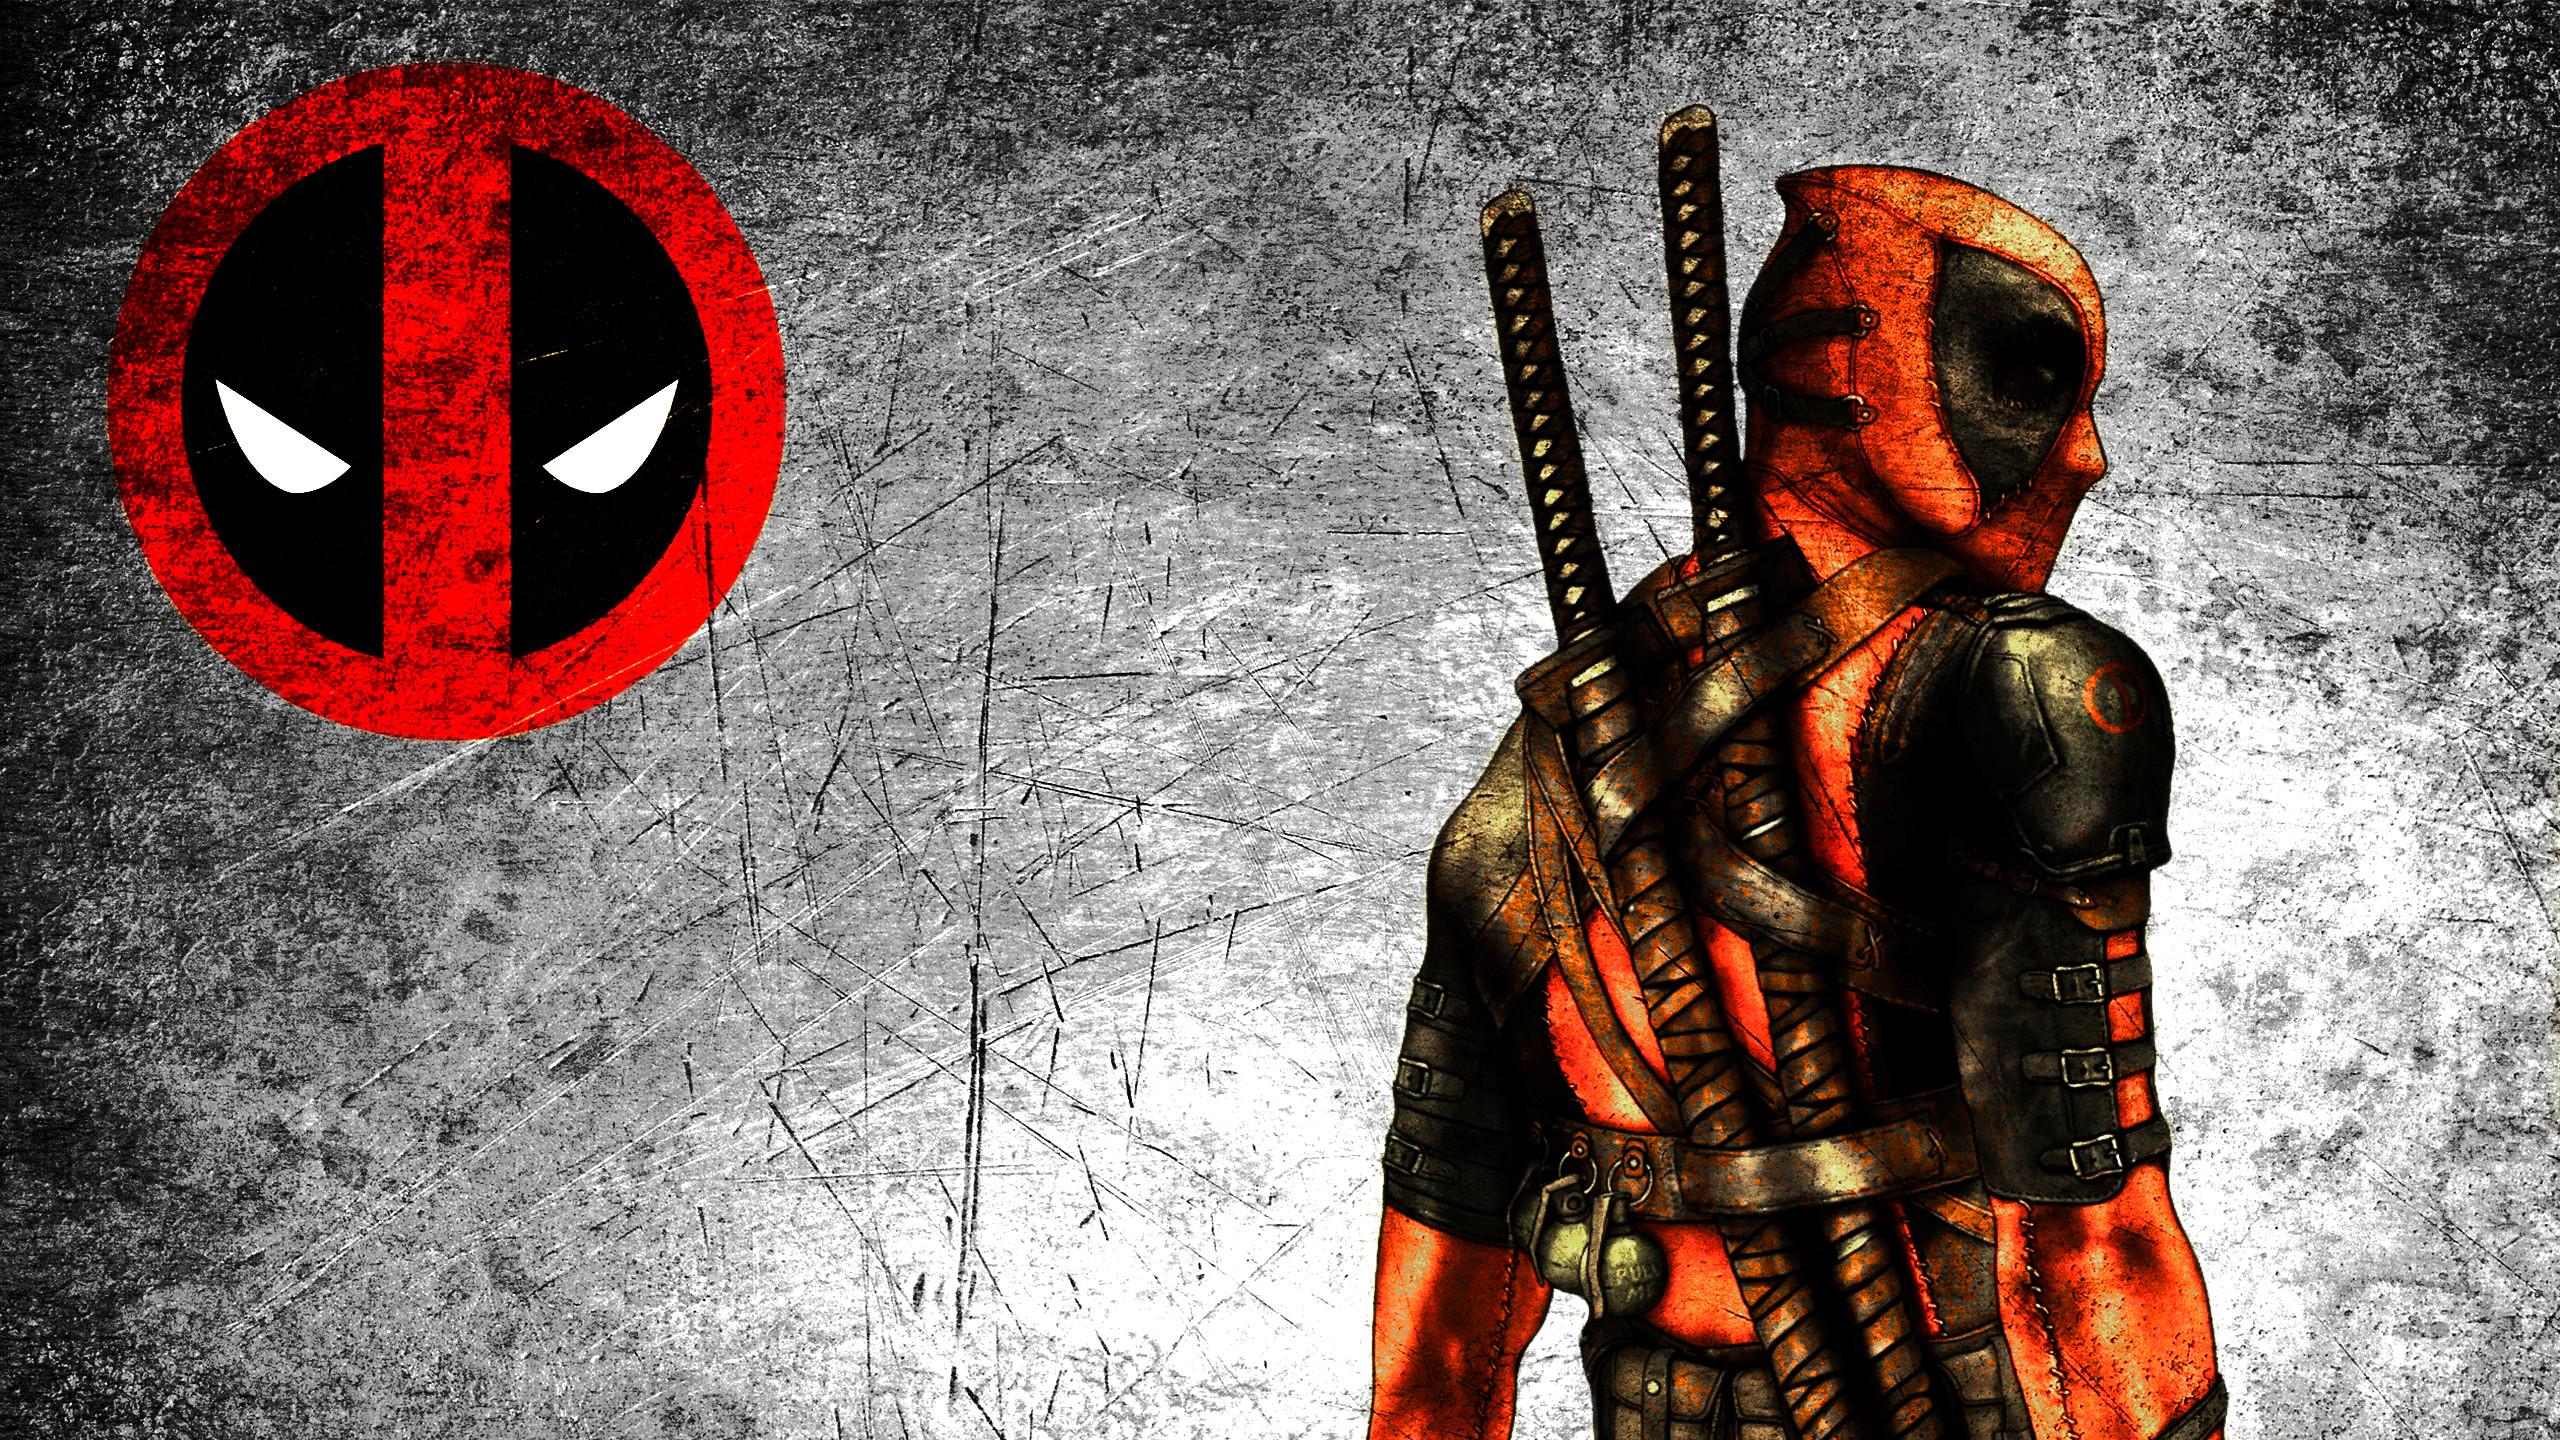 Res: 2560x1440, Deadpool HD Wallpaper Full HD Pictures